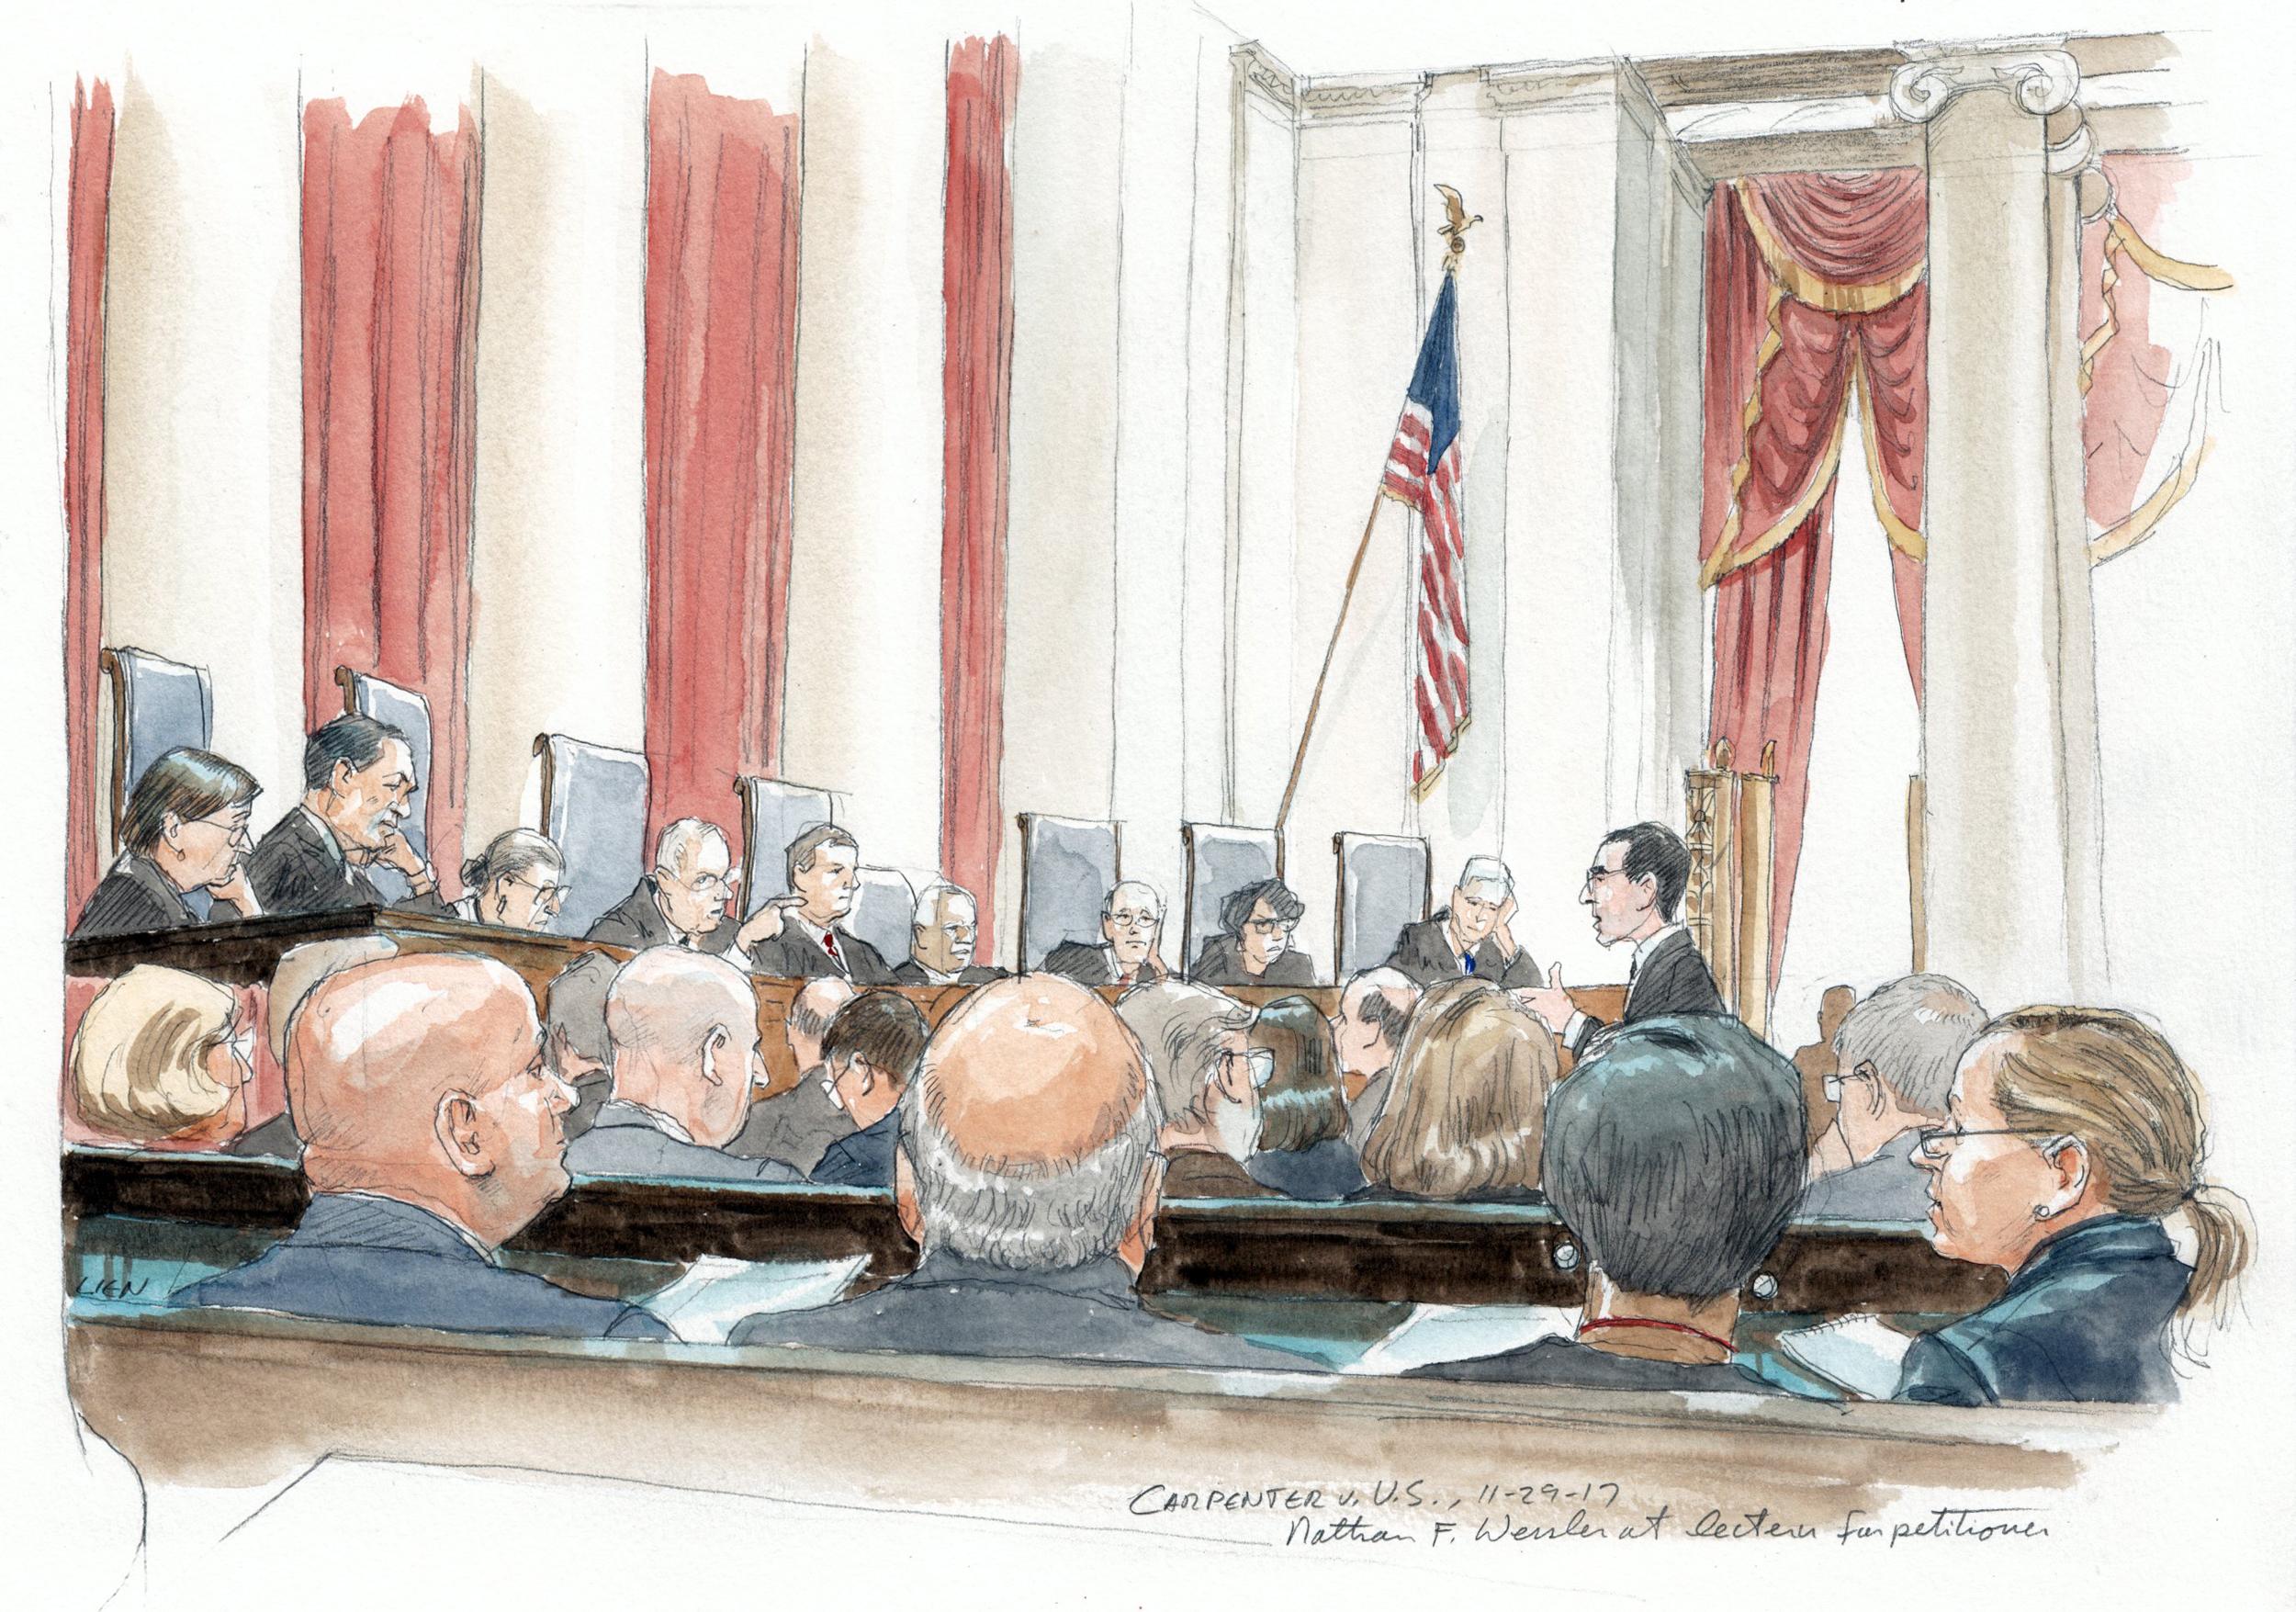 Image: Nathan F. Wessler at lectern for petitioner in front of Supreme Court Justices on Nov. 29, 2017.